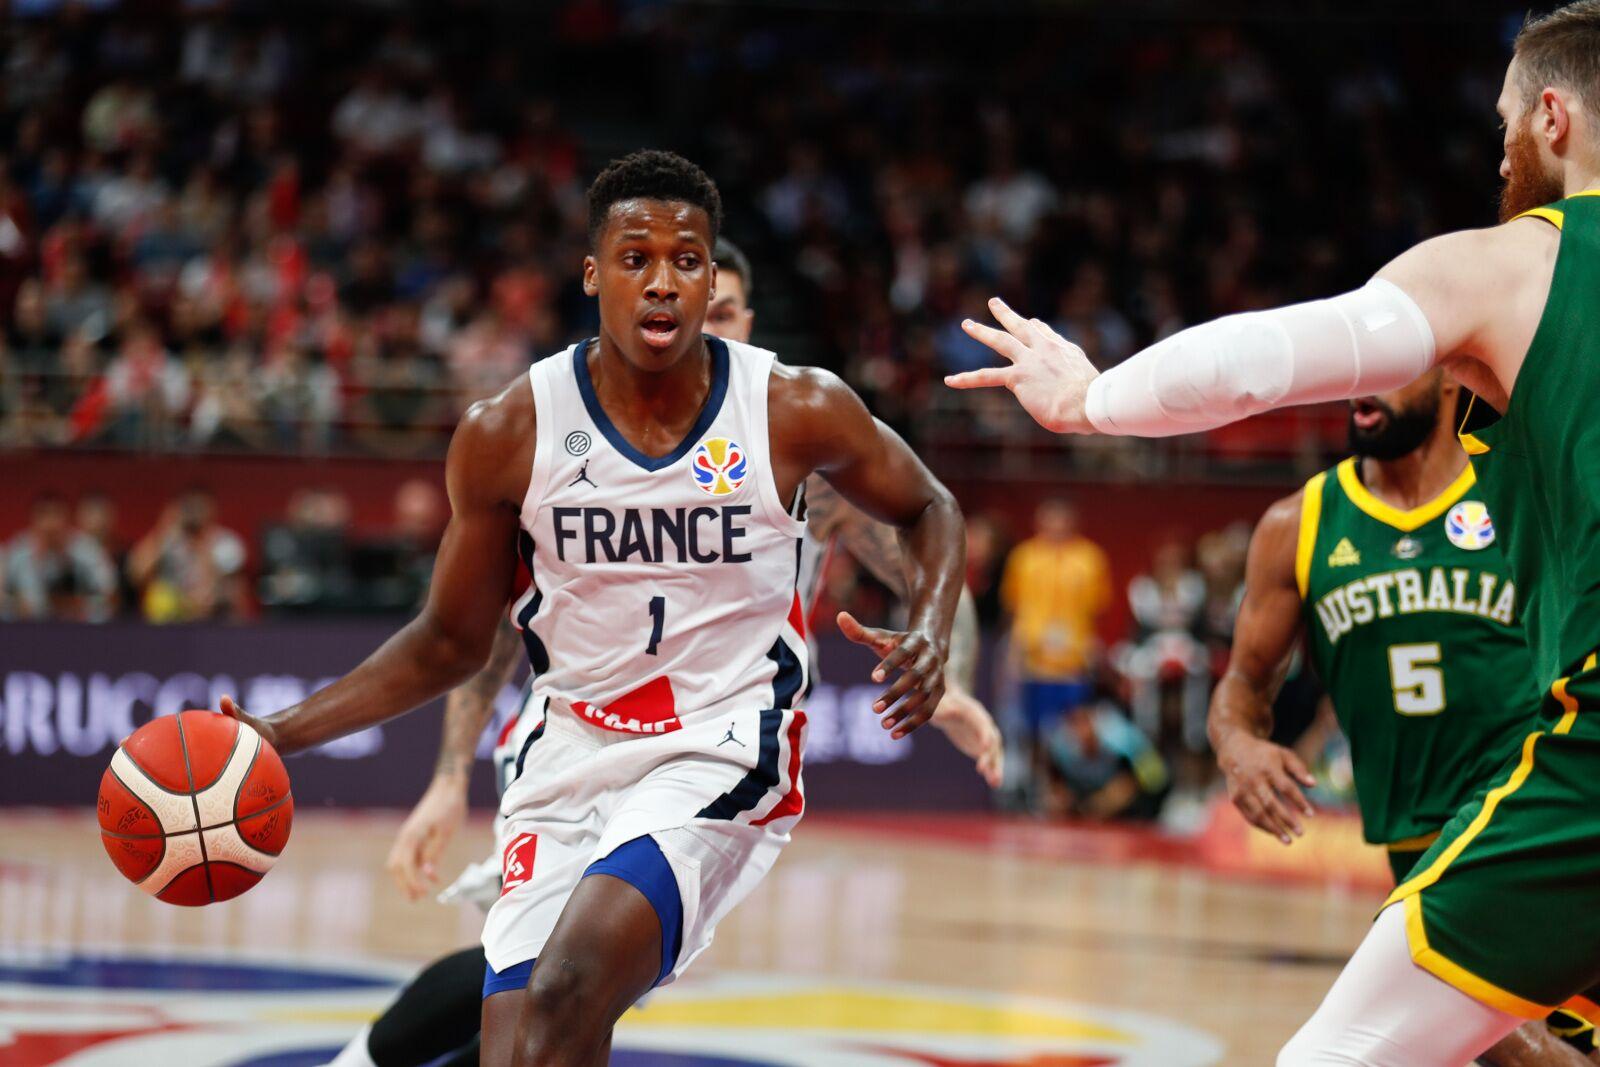 New York Knicks: Frank Ntilikina reacts to his FIBA World Cup ending